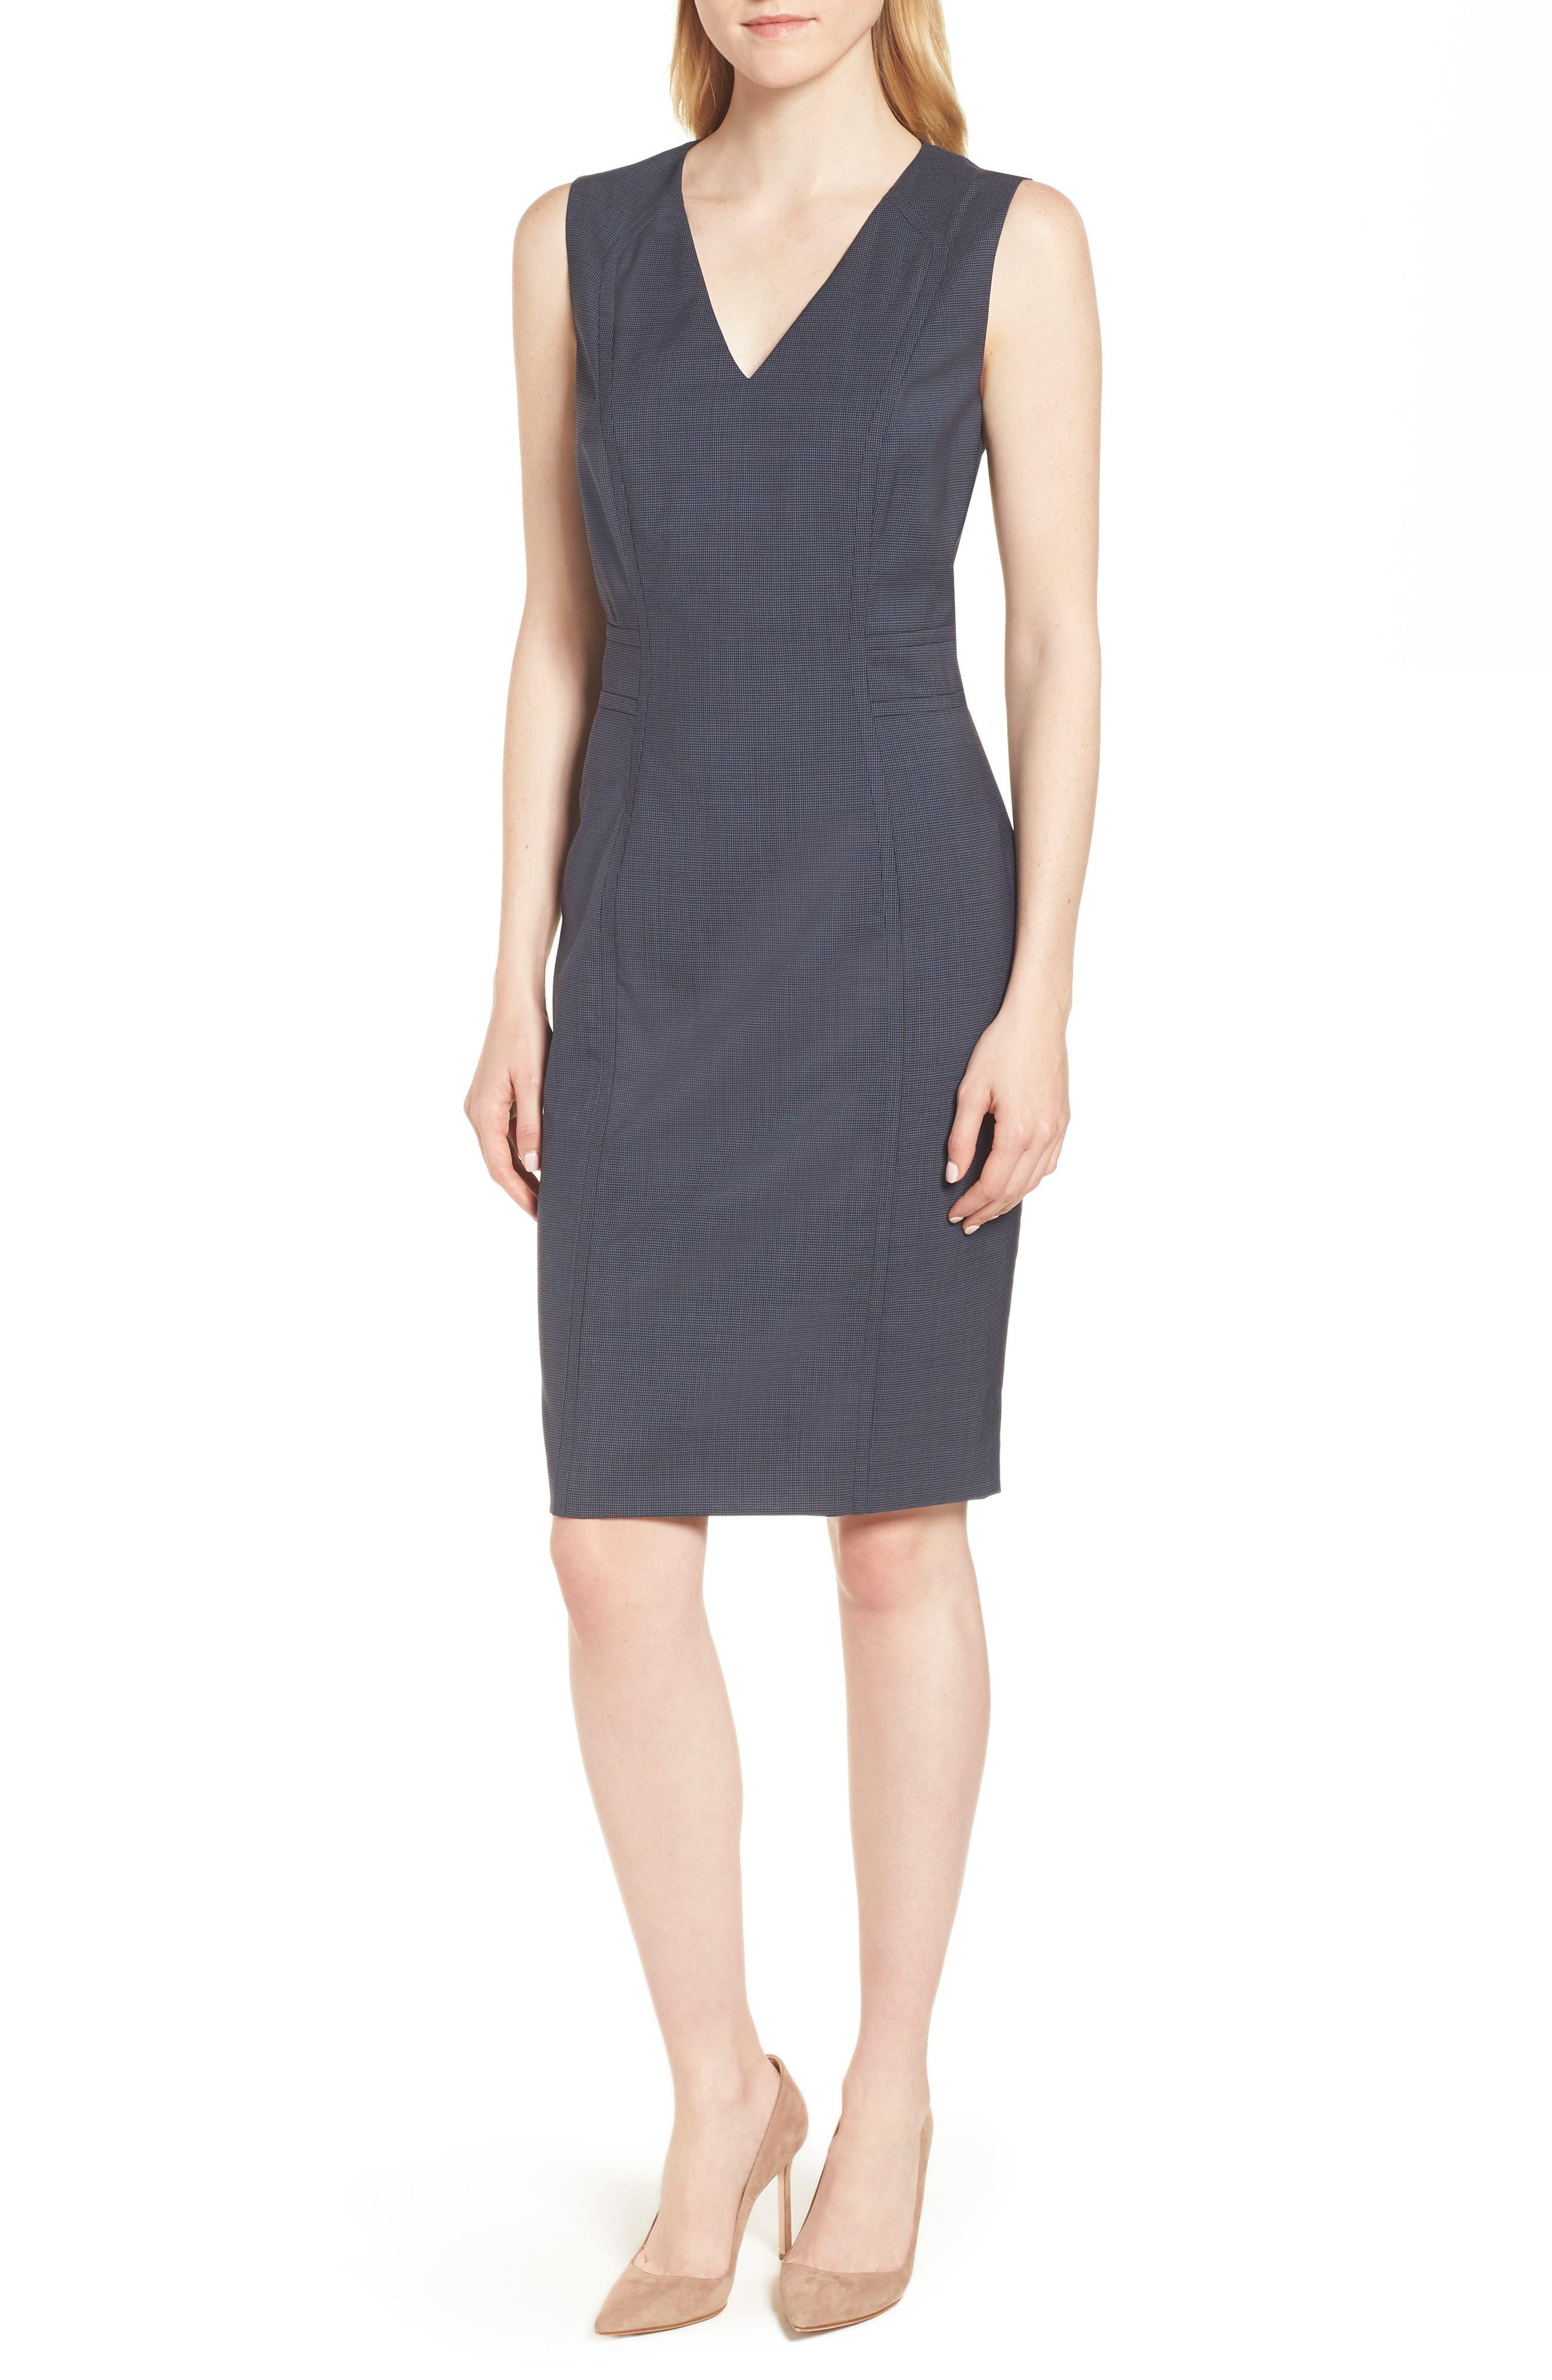 Dalouise Pepita Stretch Wool Sheath Dress,                         Main,                         color,